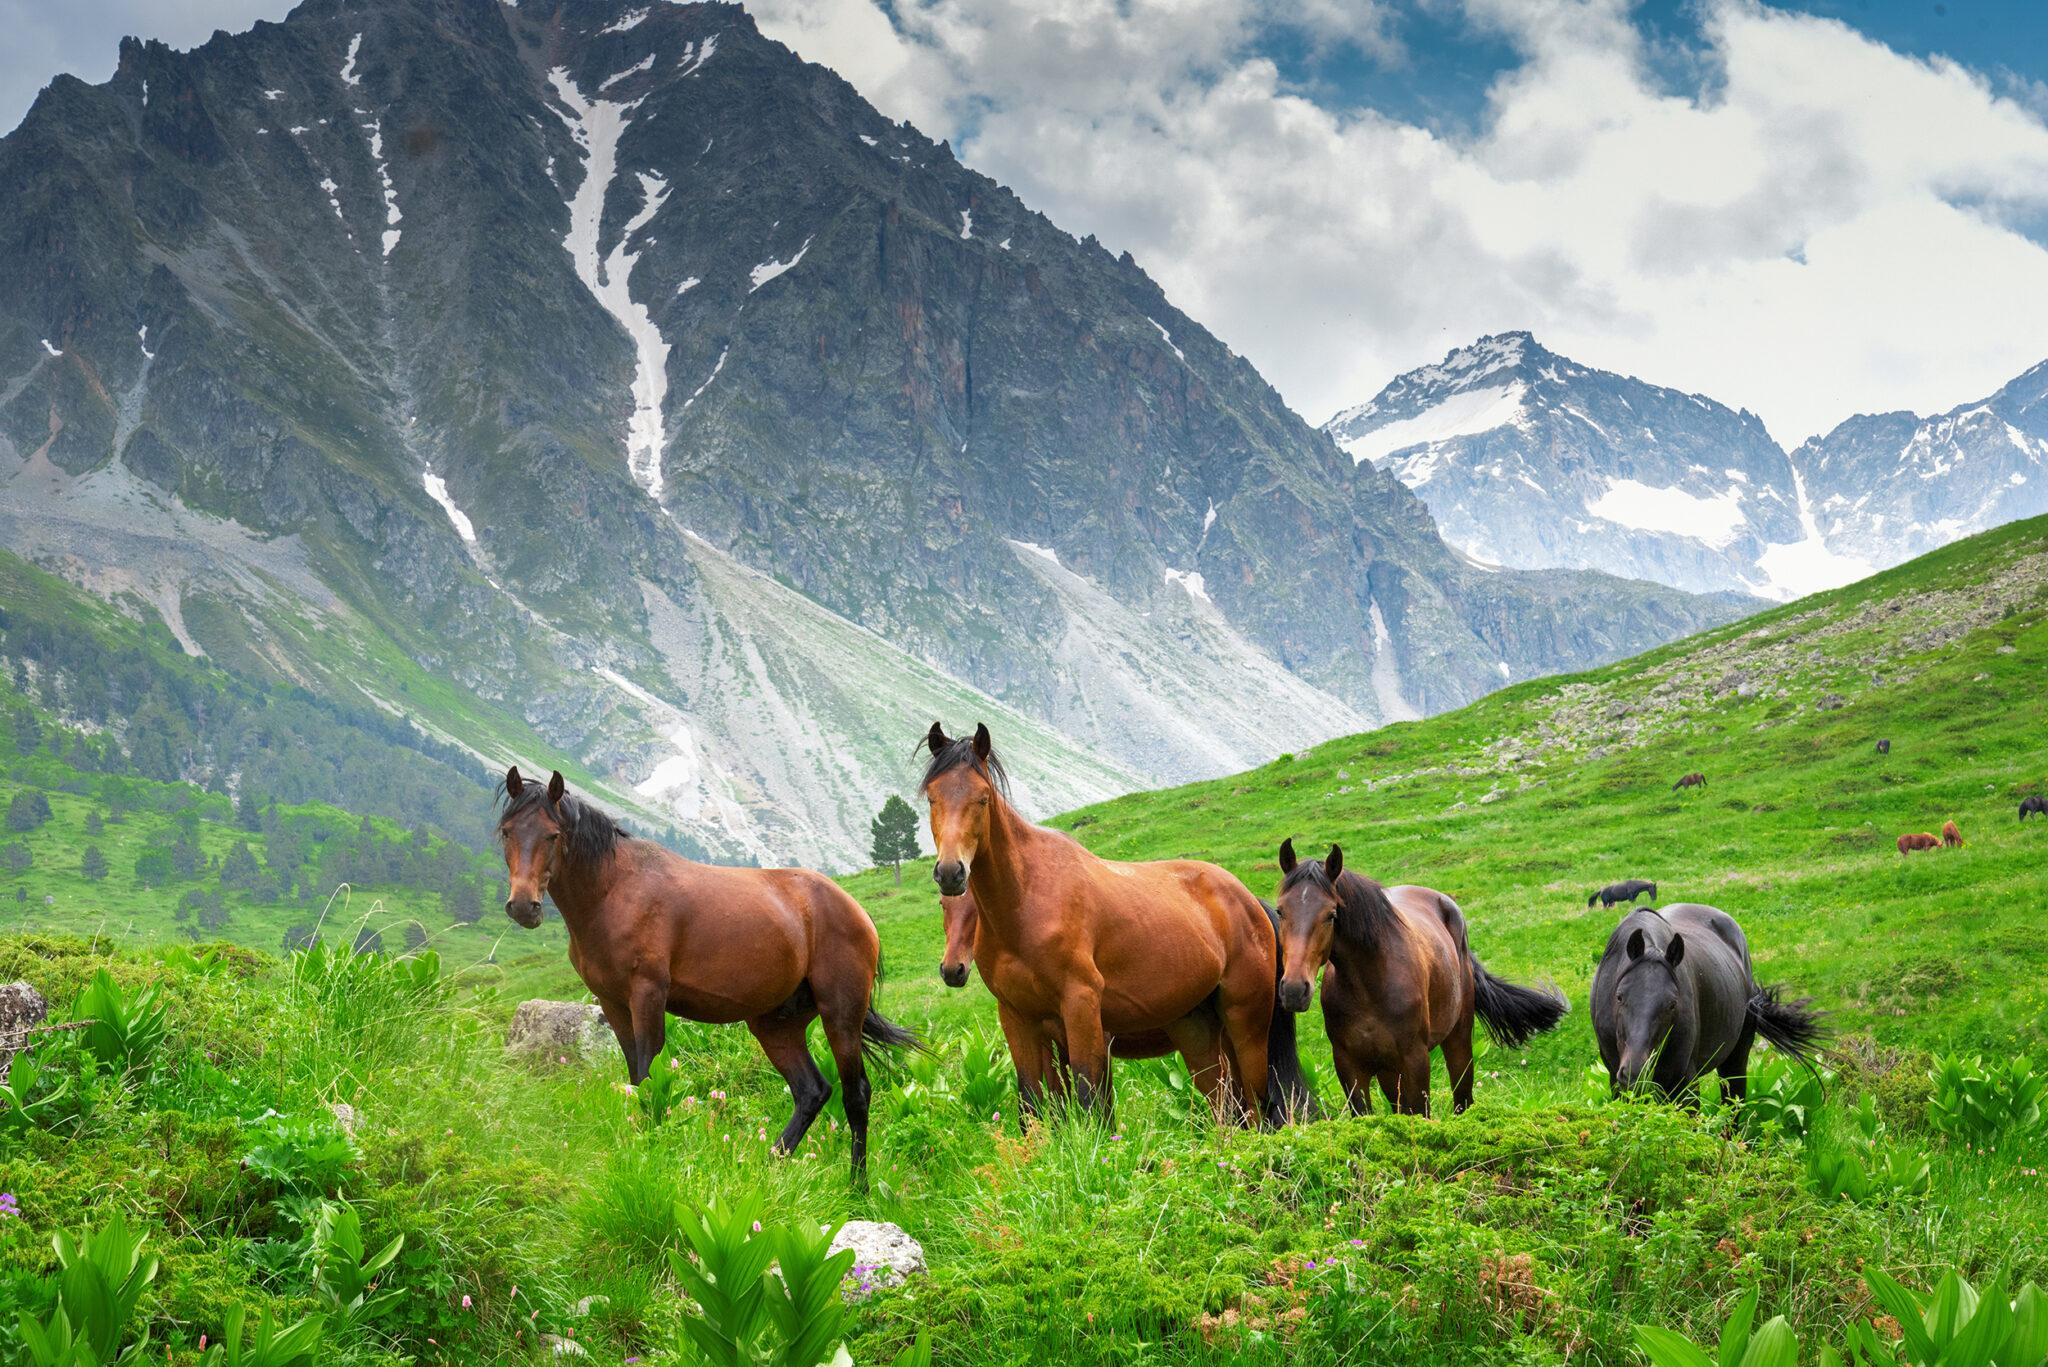 Horse Breed: Karachay - photo by Ambartsumian Valery/Shutterstock.com - Globetrotting horse riding holidays